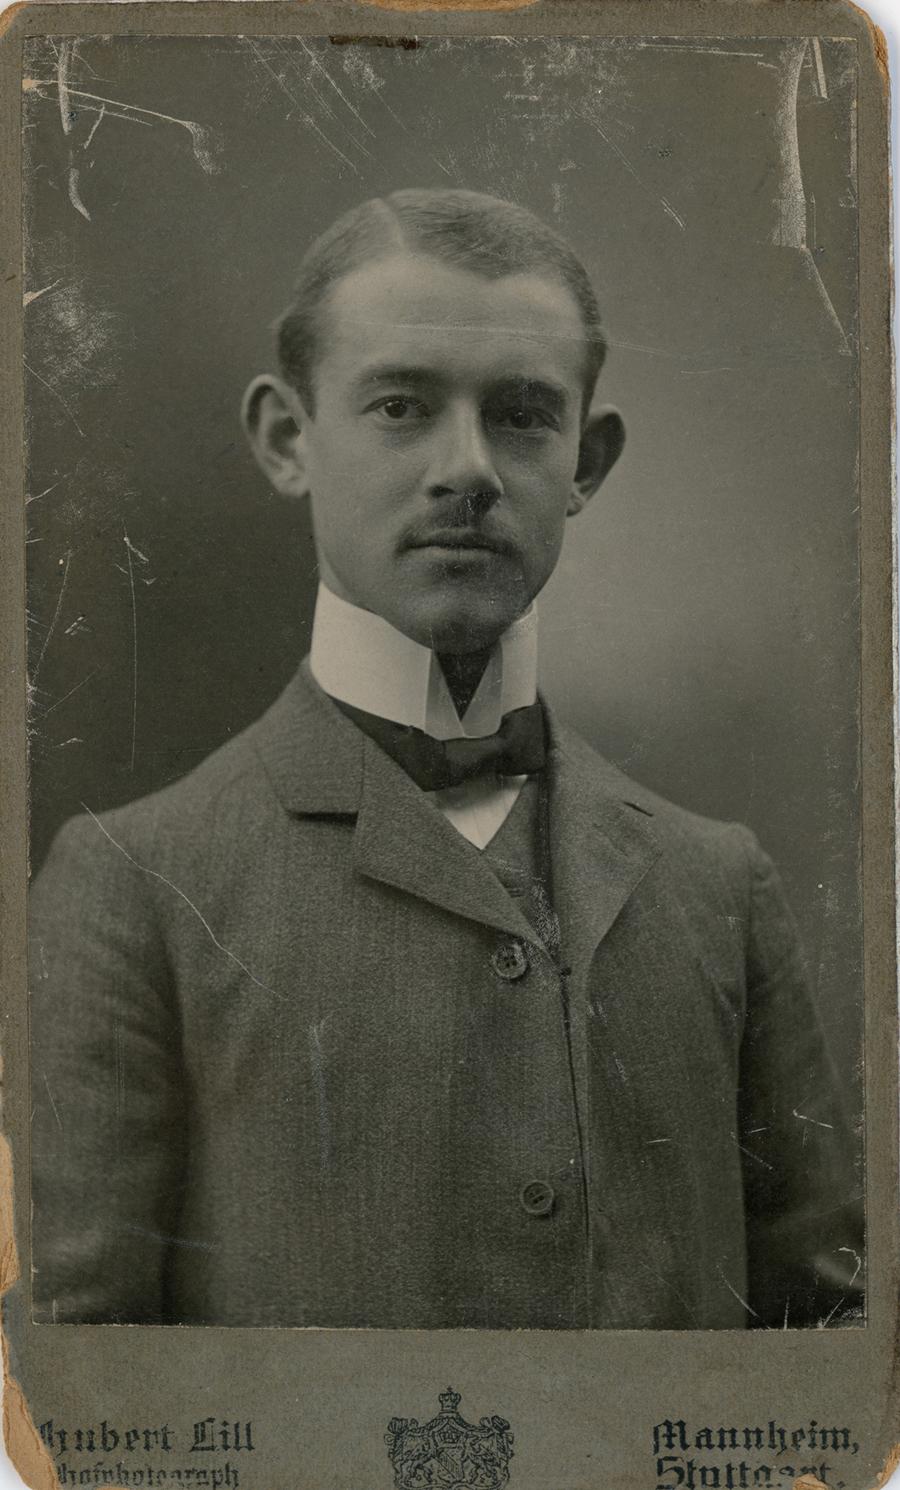 Leonhard Mann Dec 1905 Mannheim Stuttart